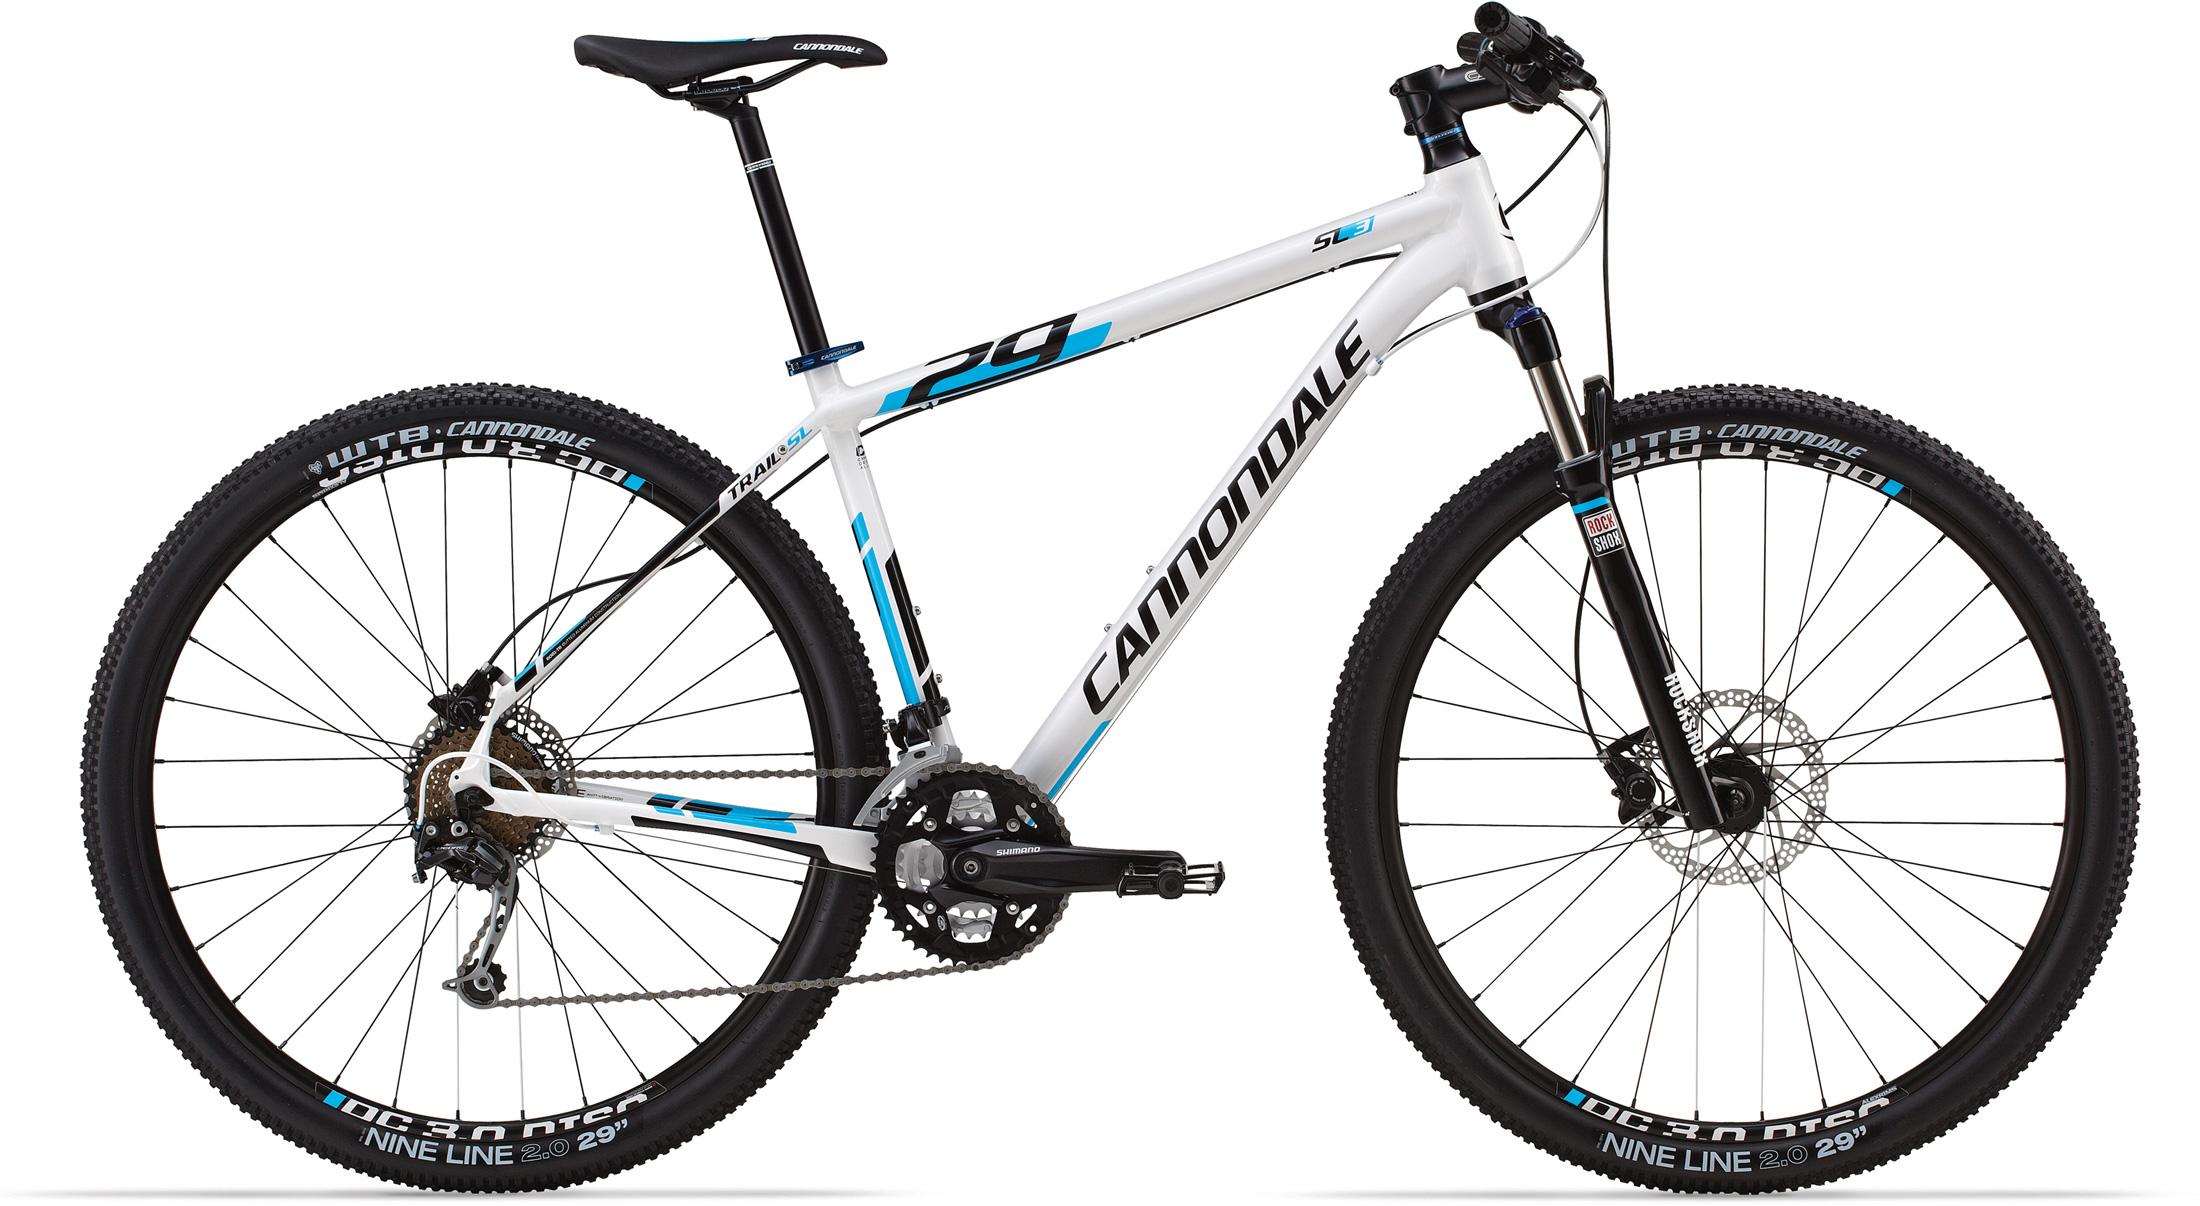 6dacc256206 Cannondale Trail SL 29er 3 - Pedal Bike Shop -Littleton, Colorado